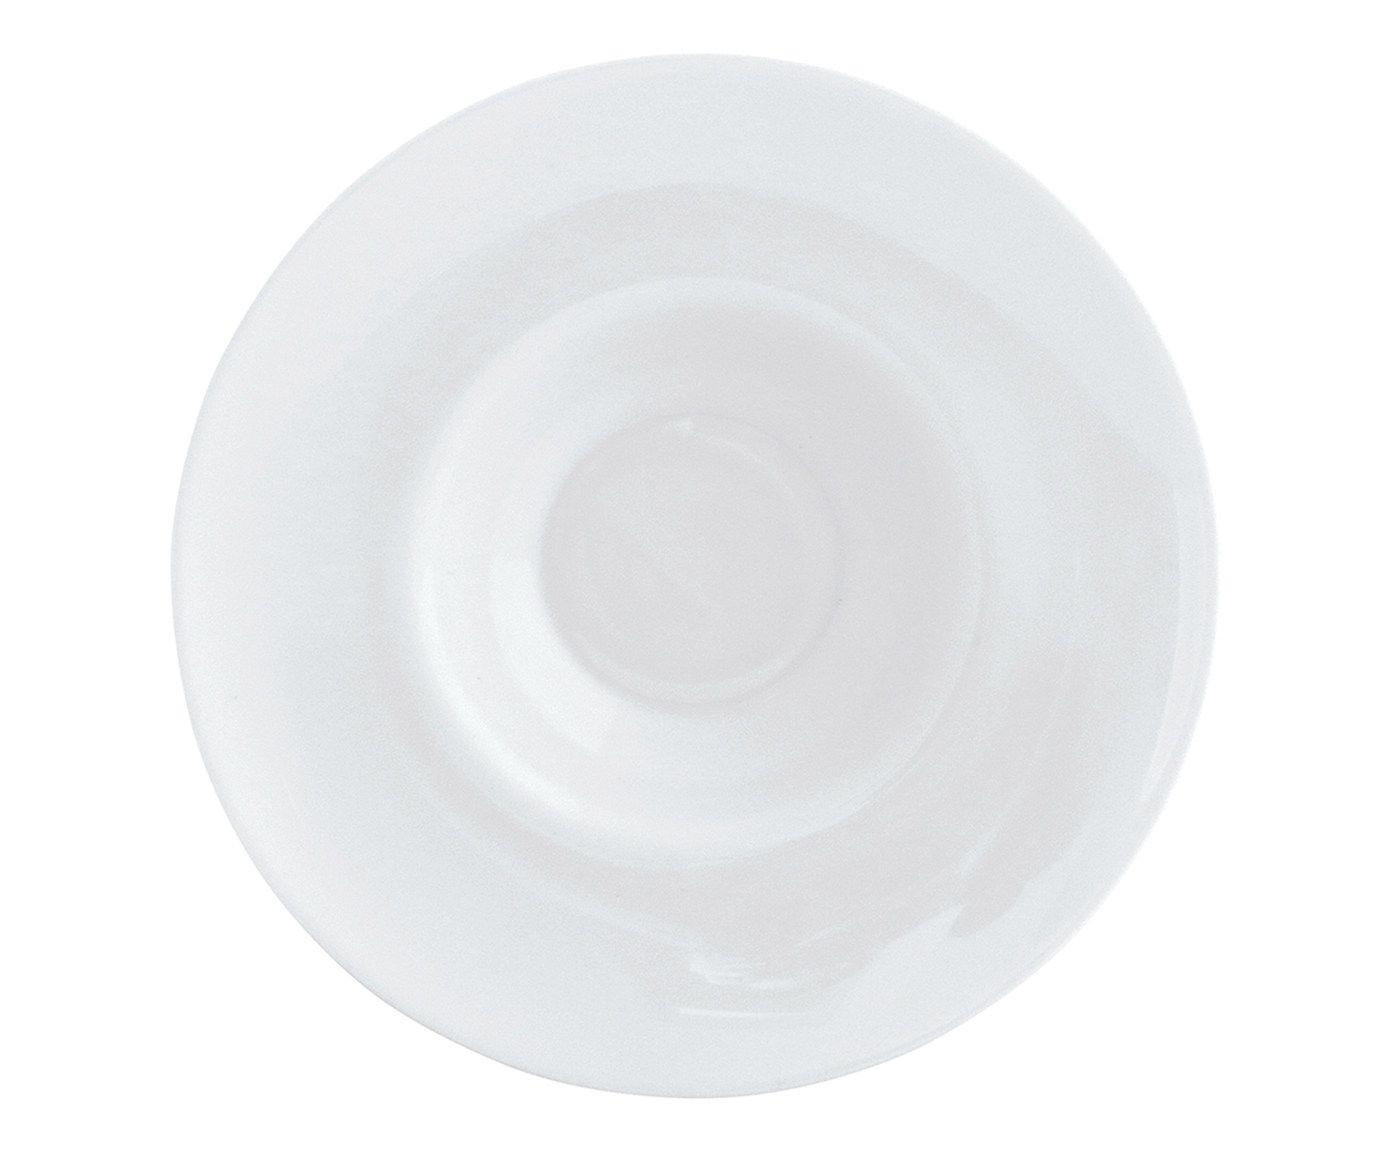 Prato para Risoto Intensity - 29cm   Westwing.com.br